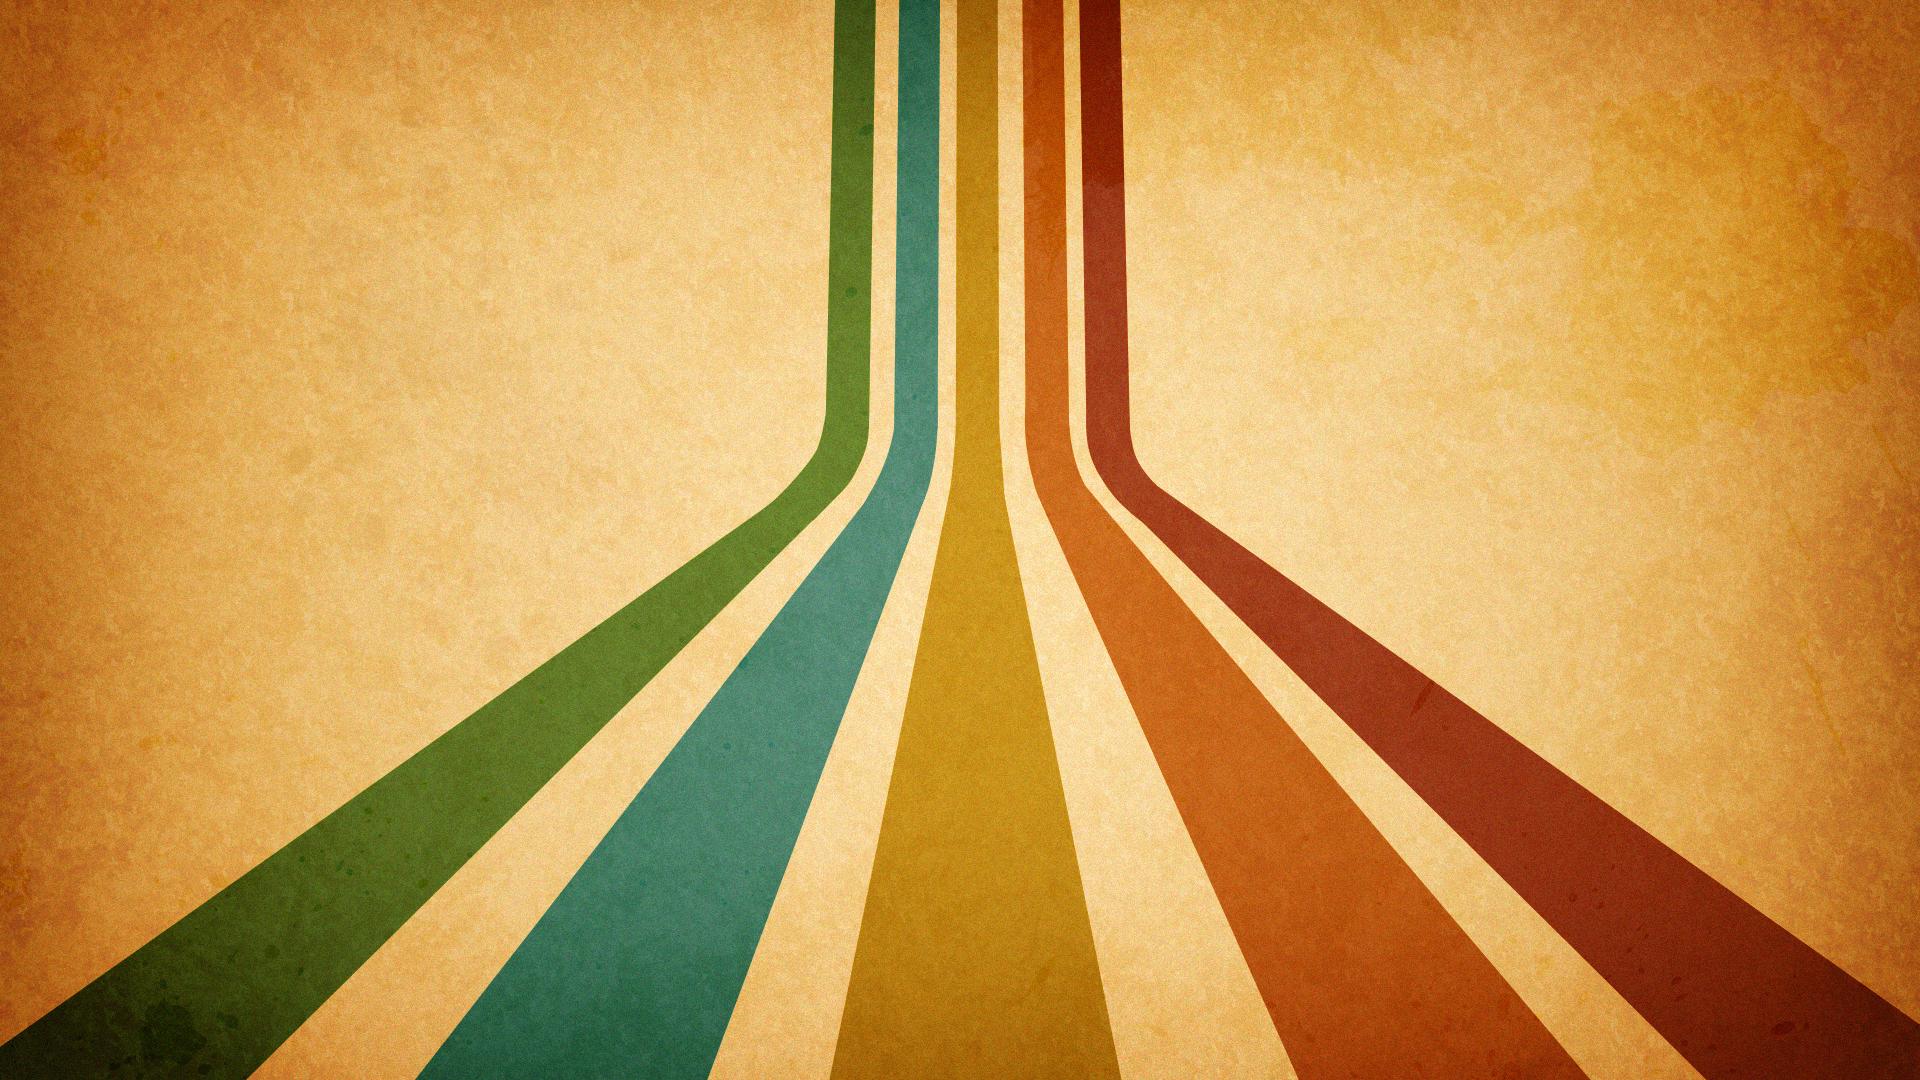 High Resolution Wallpaper | Retro 1920x1080 px